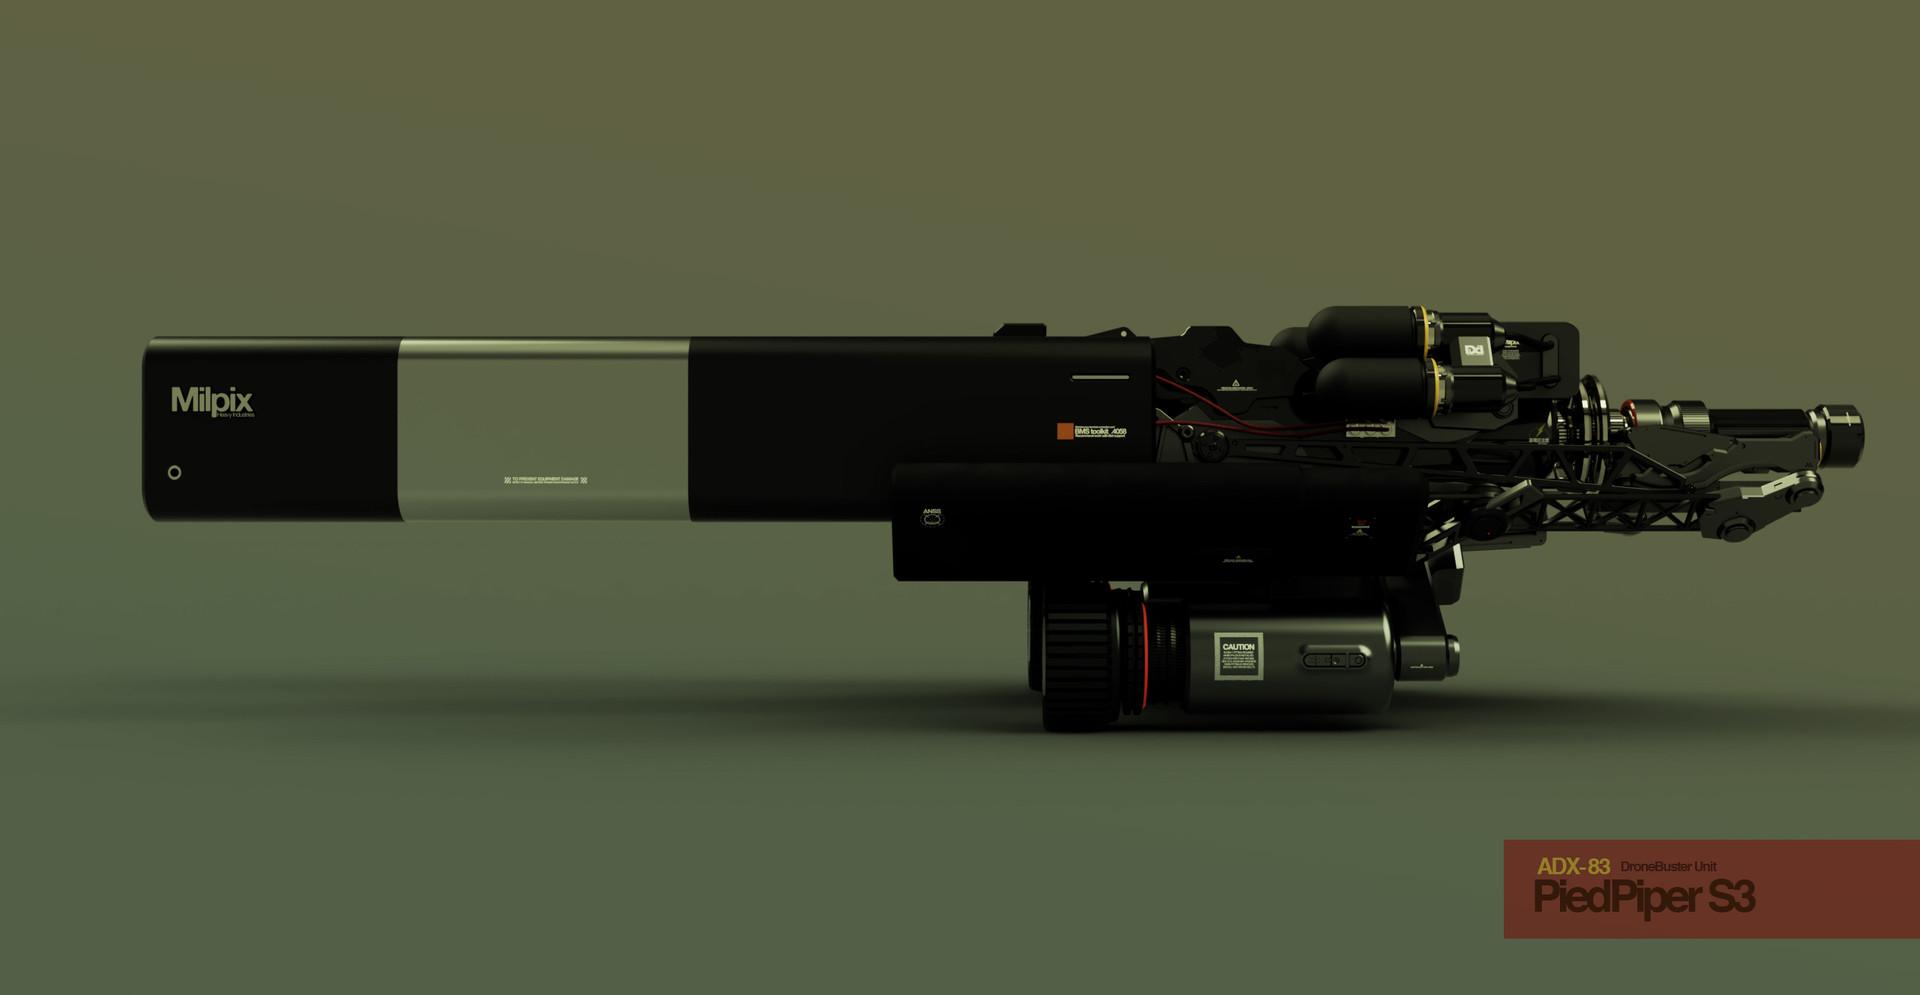 Milpix b444